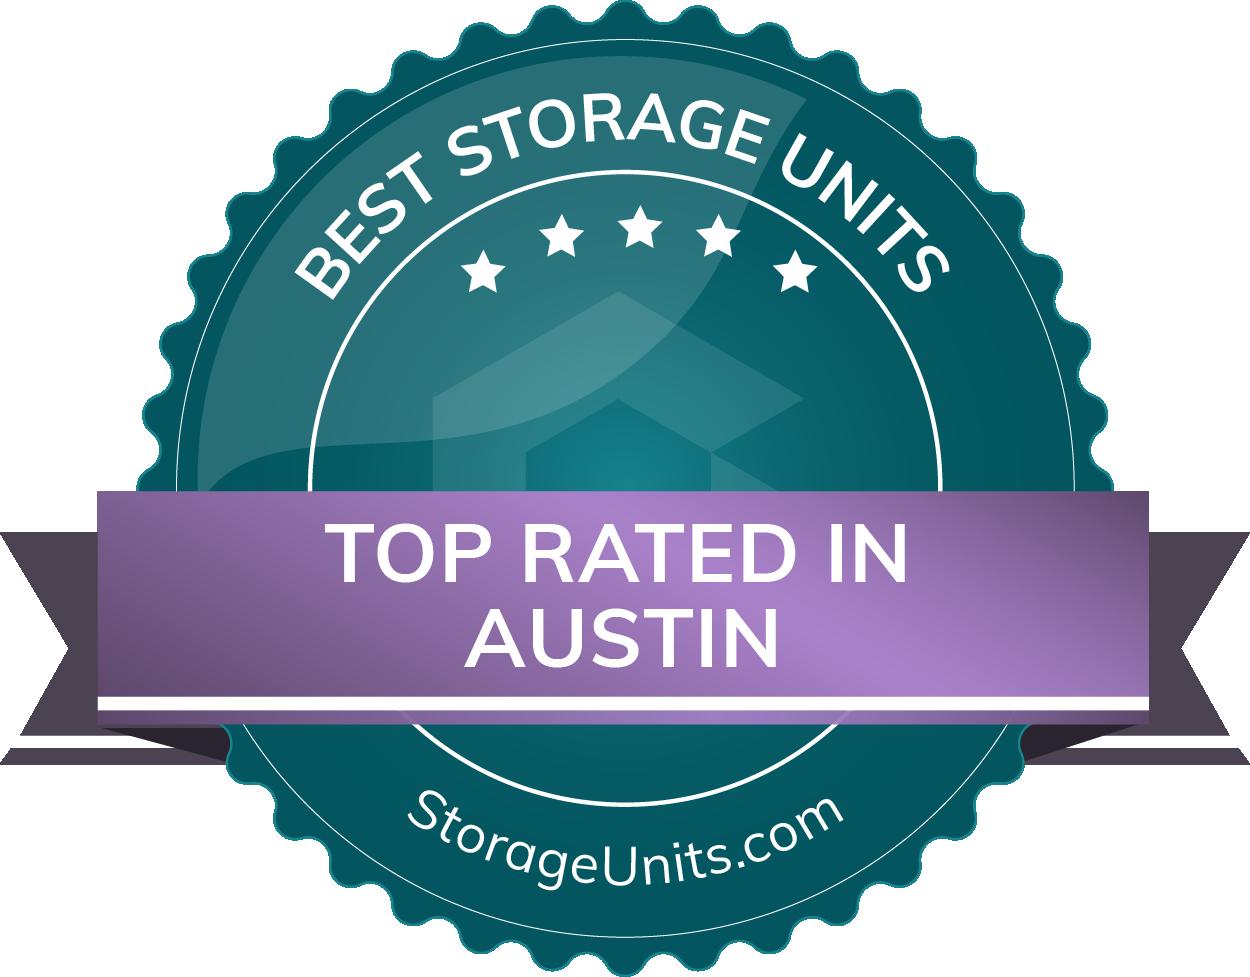 Best Self Storage Units in Austin, TX